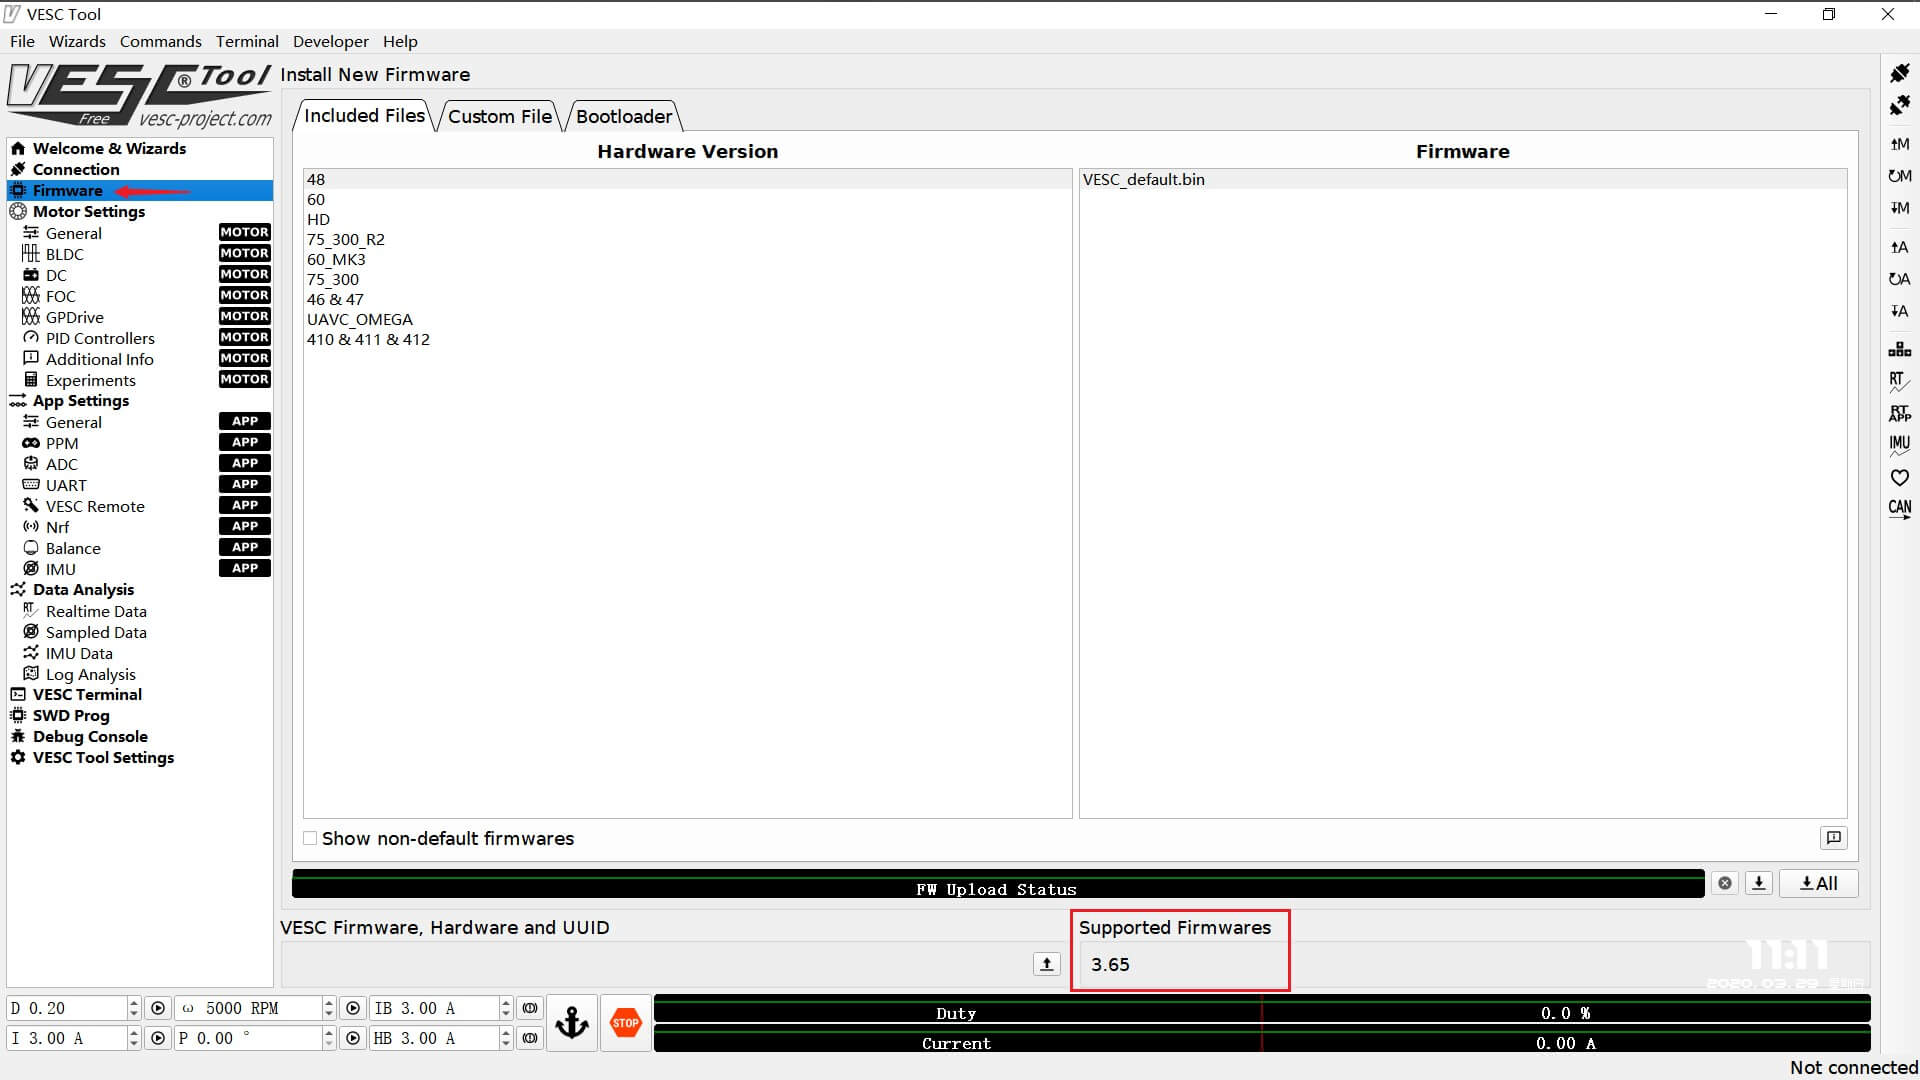 VESC firmware version